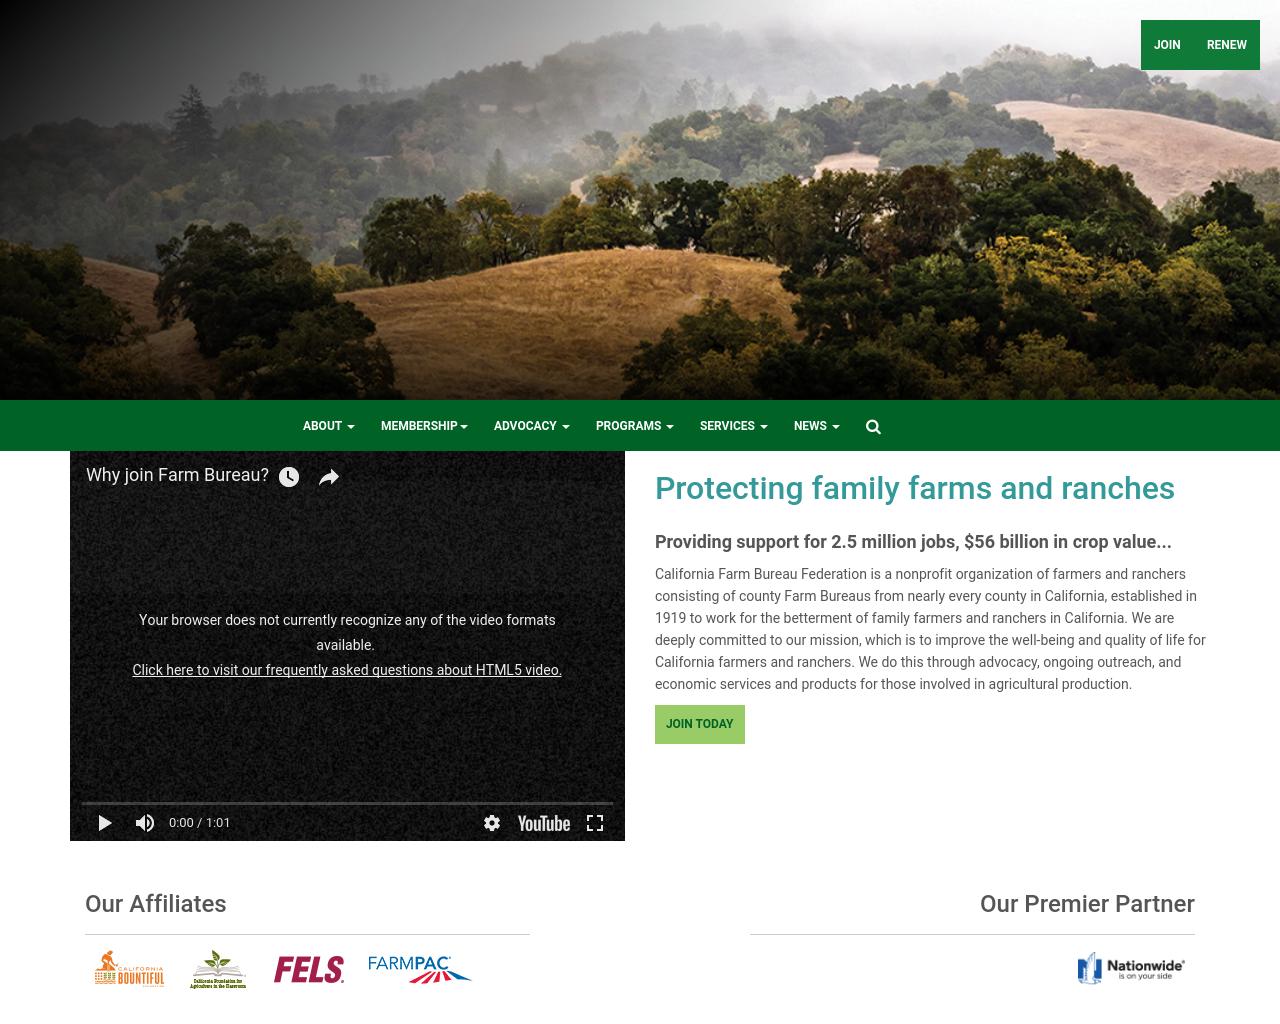 California-Farm-Bureau-Federation-Advertising-Reviews-Pricing